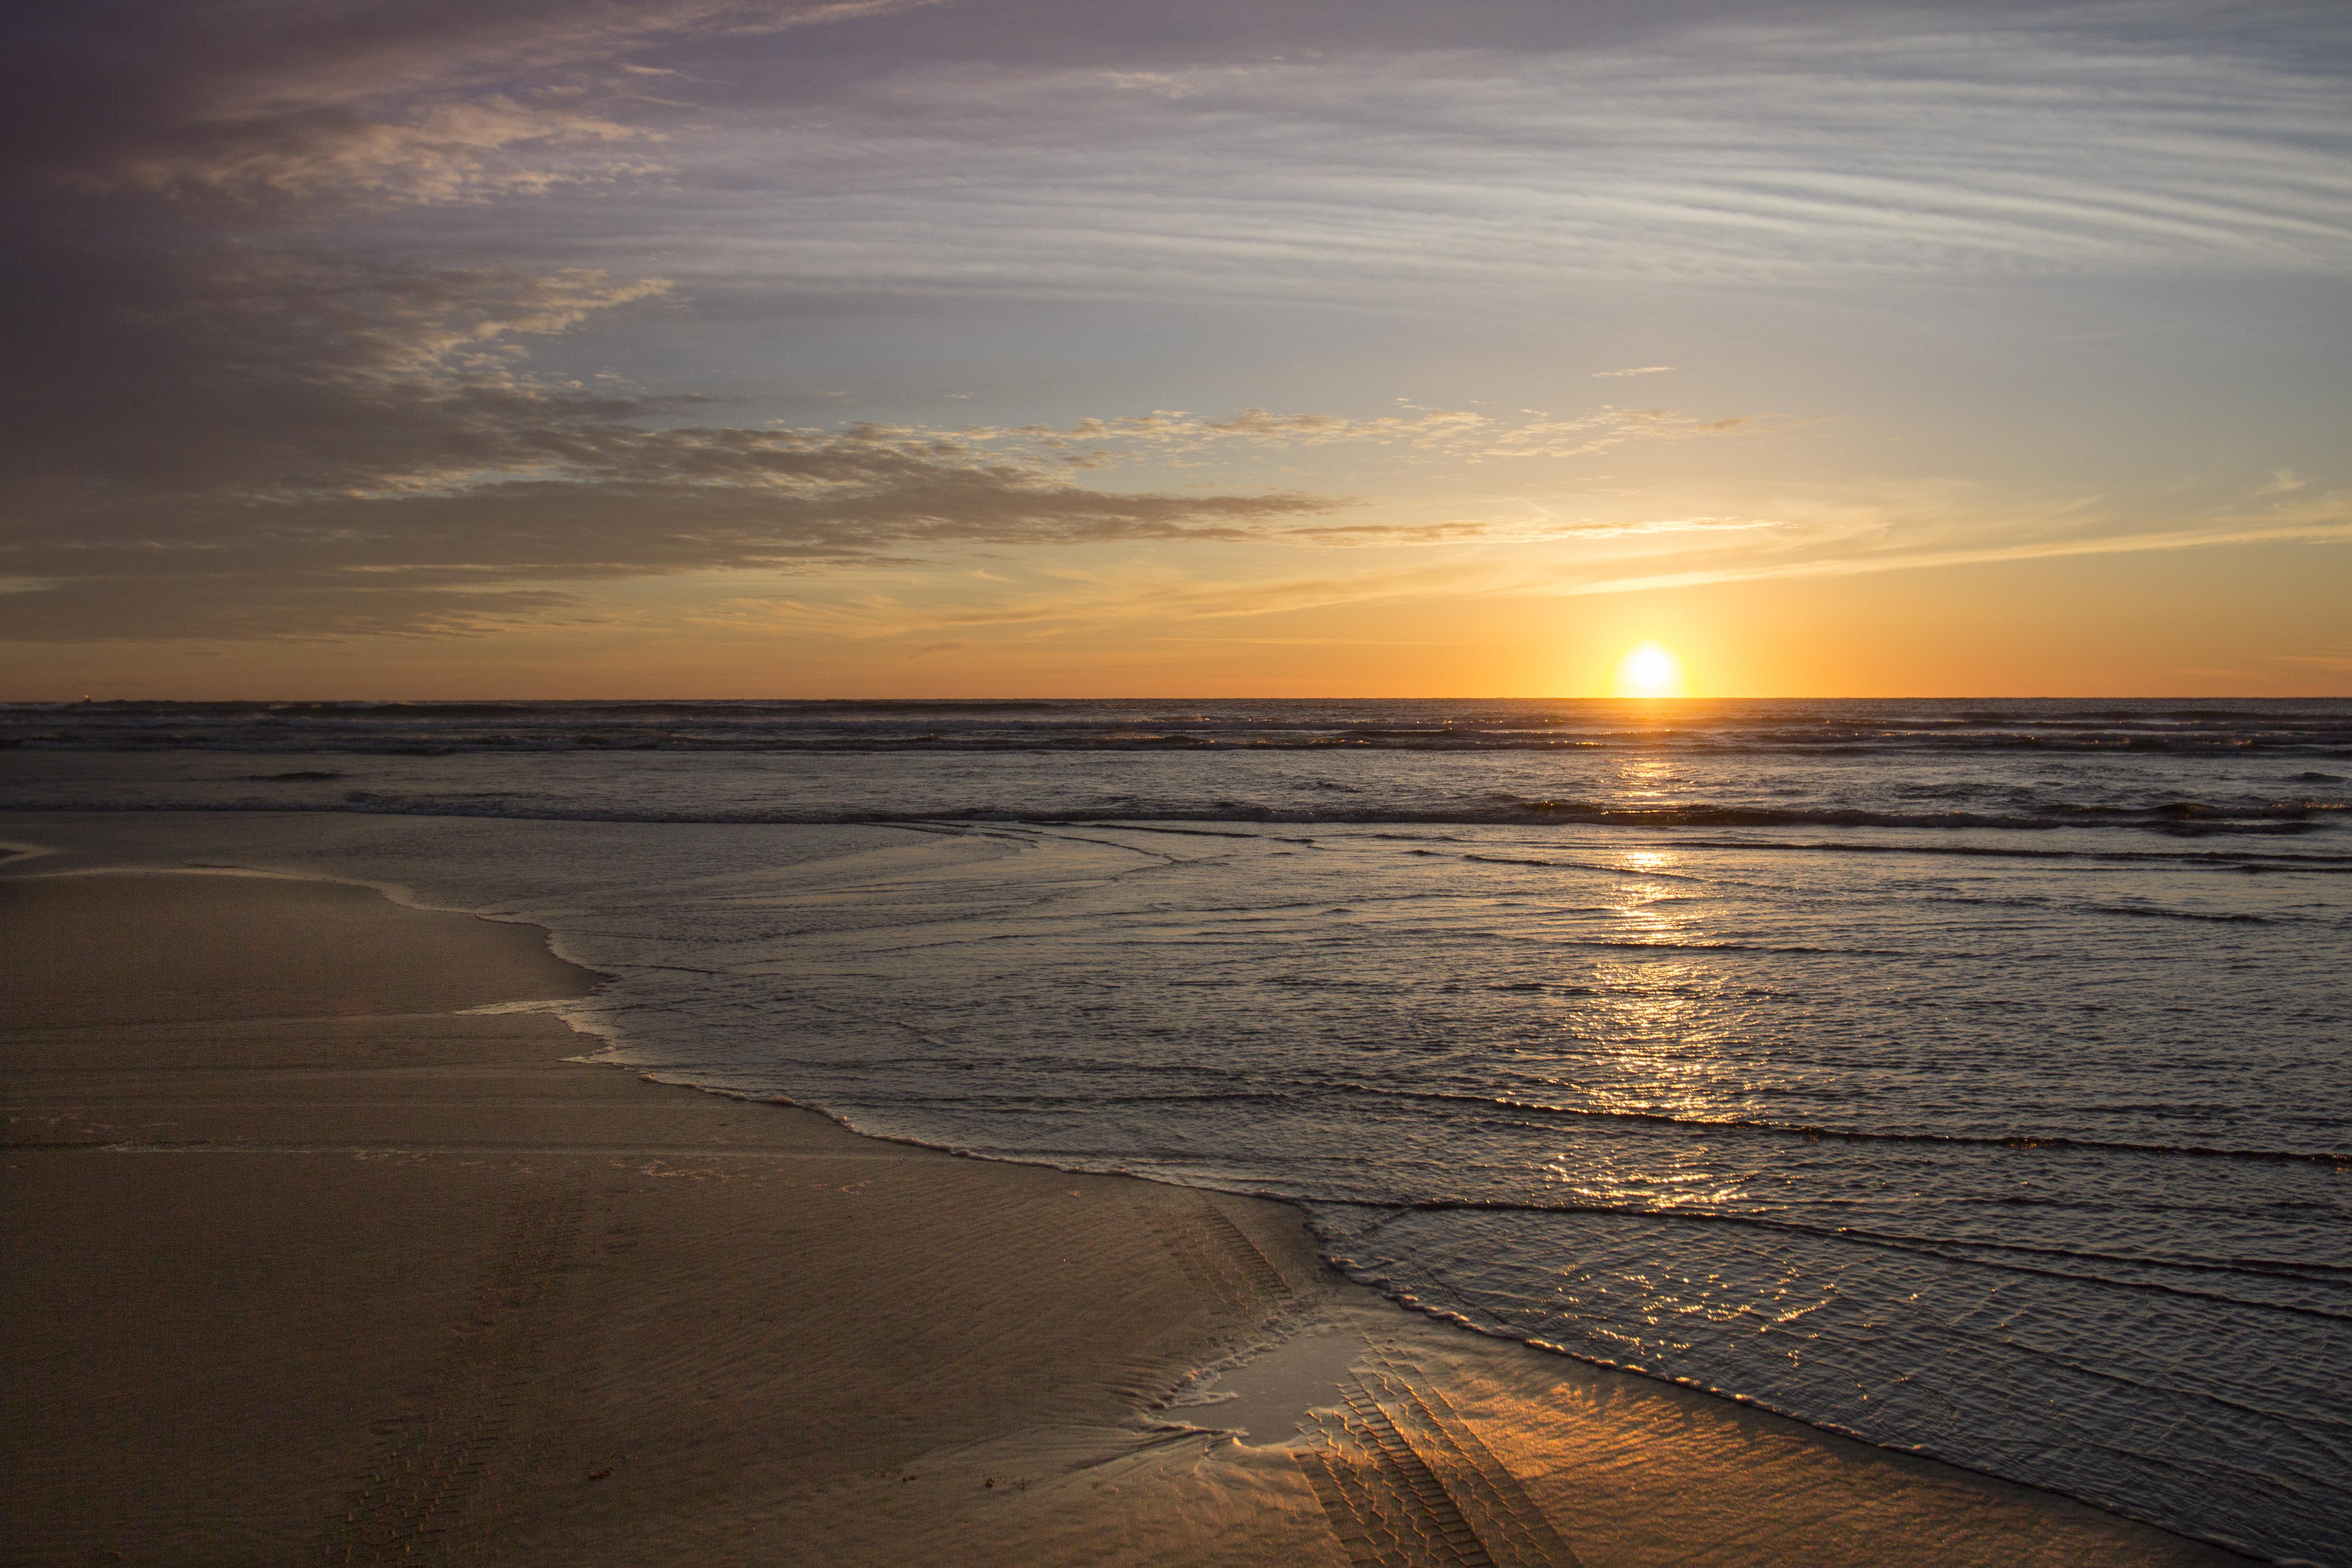 Sunset at oregon coast in february. photo